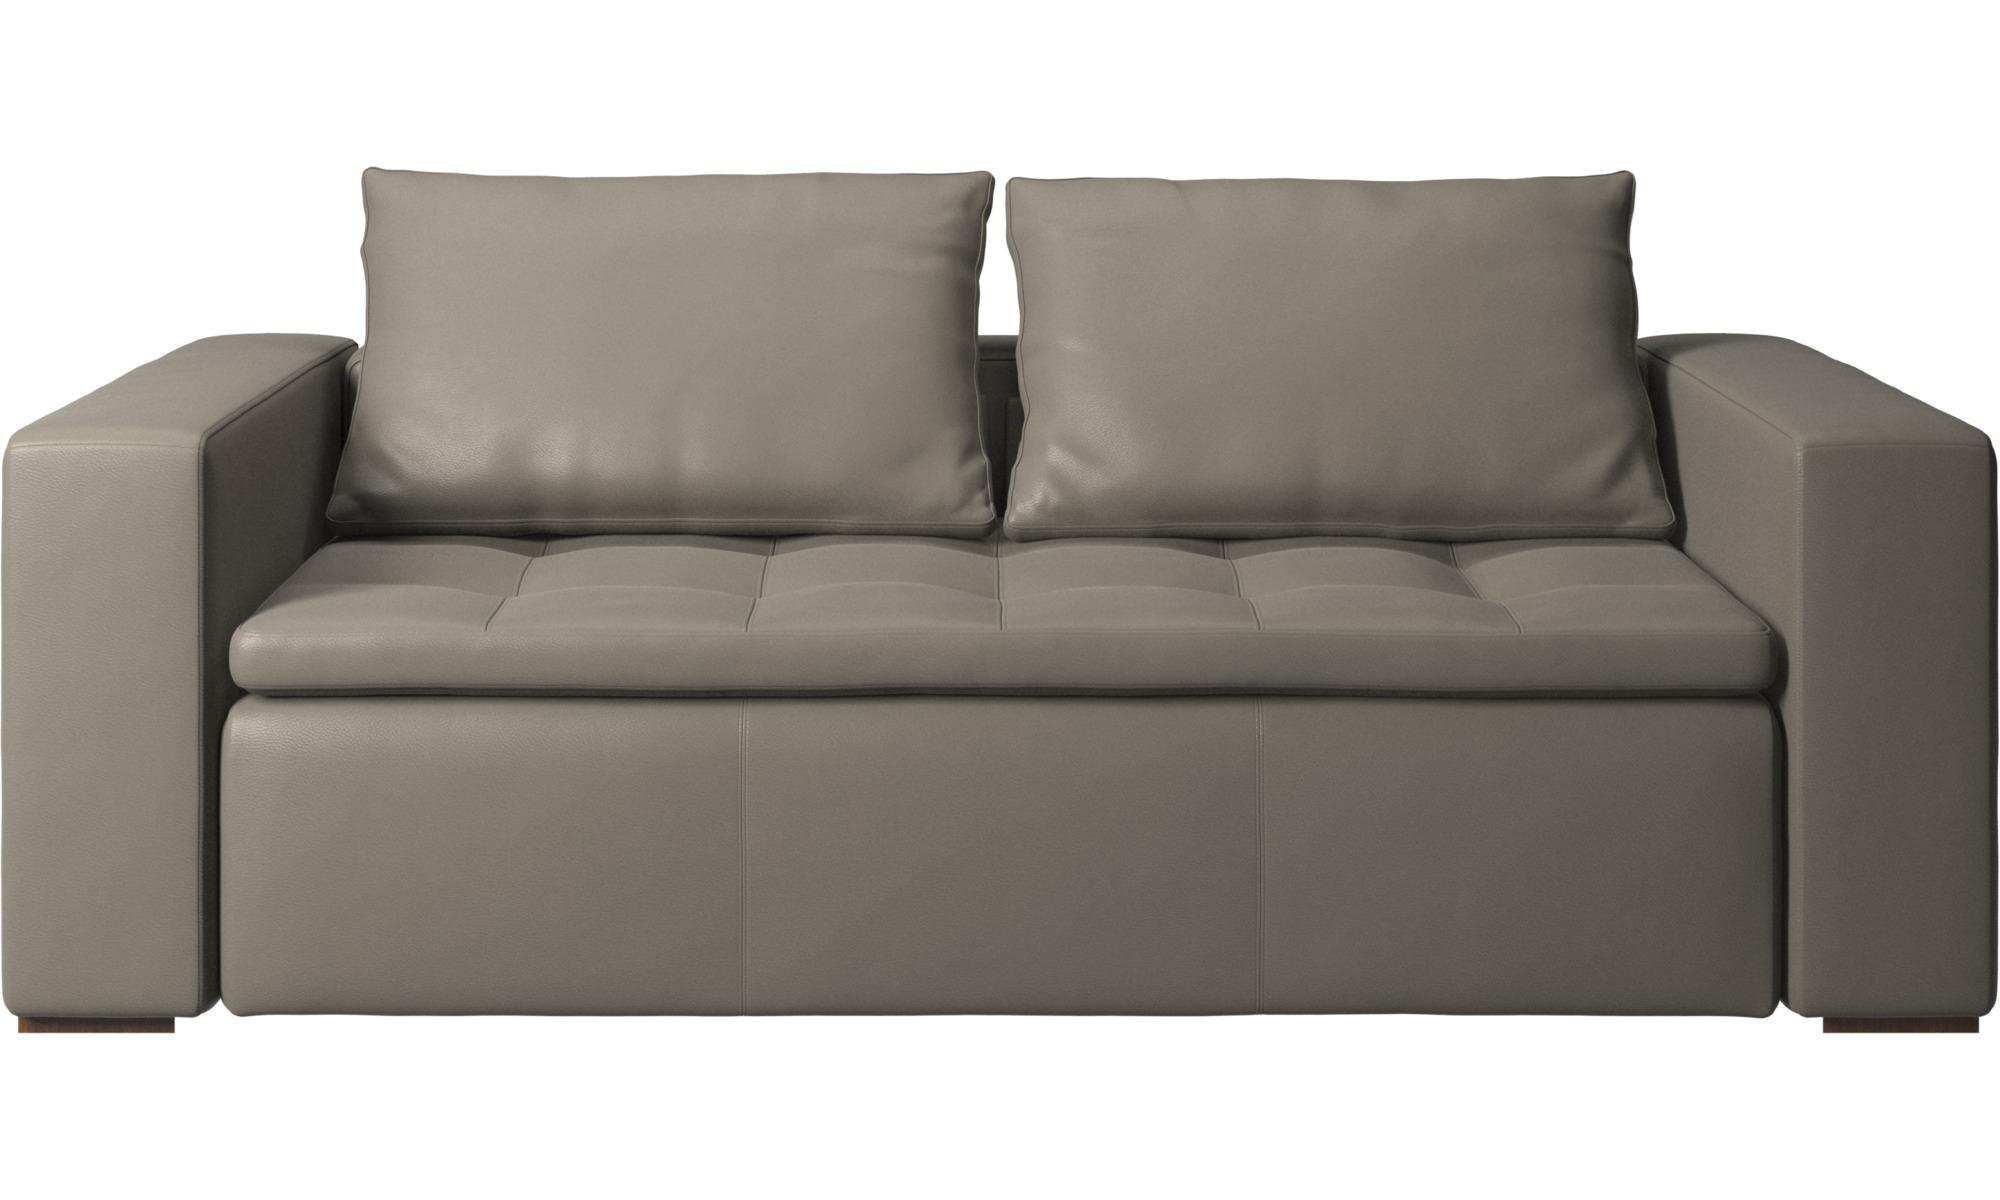 2½ personers sofaer - Mezzo sofa - Grå - Læder